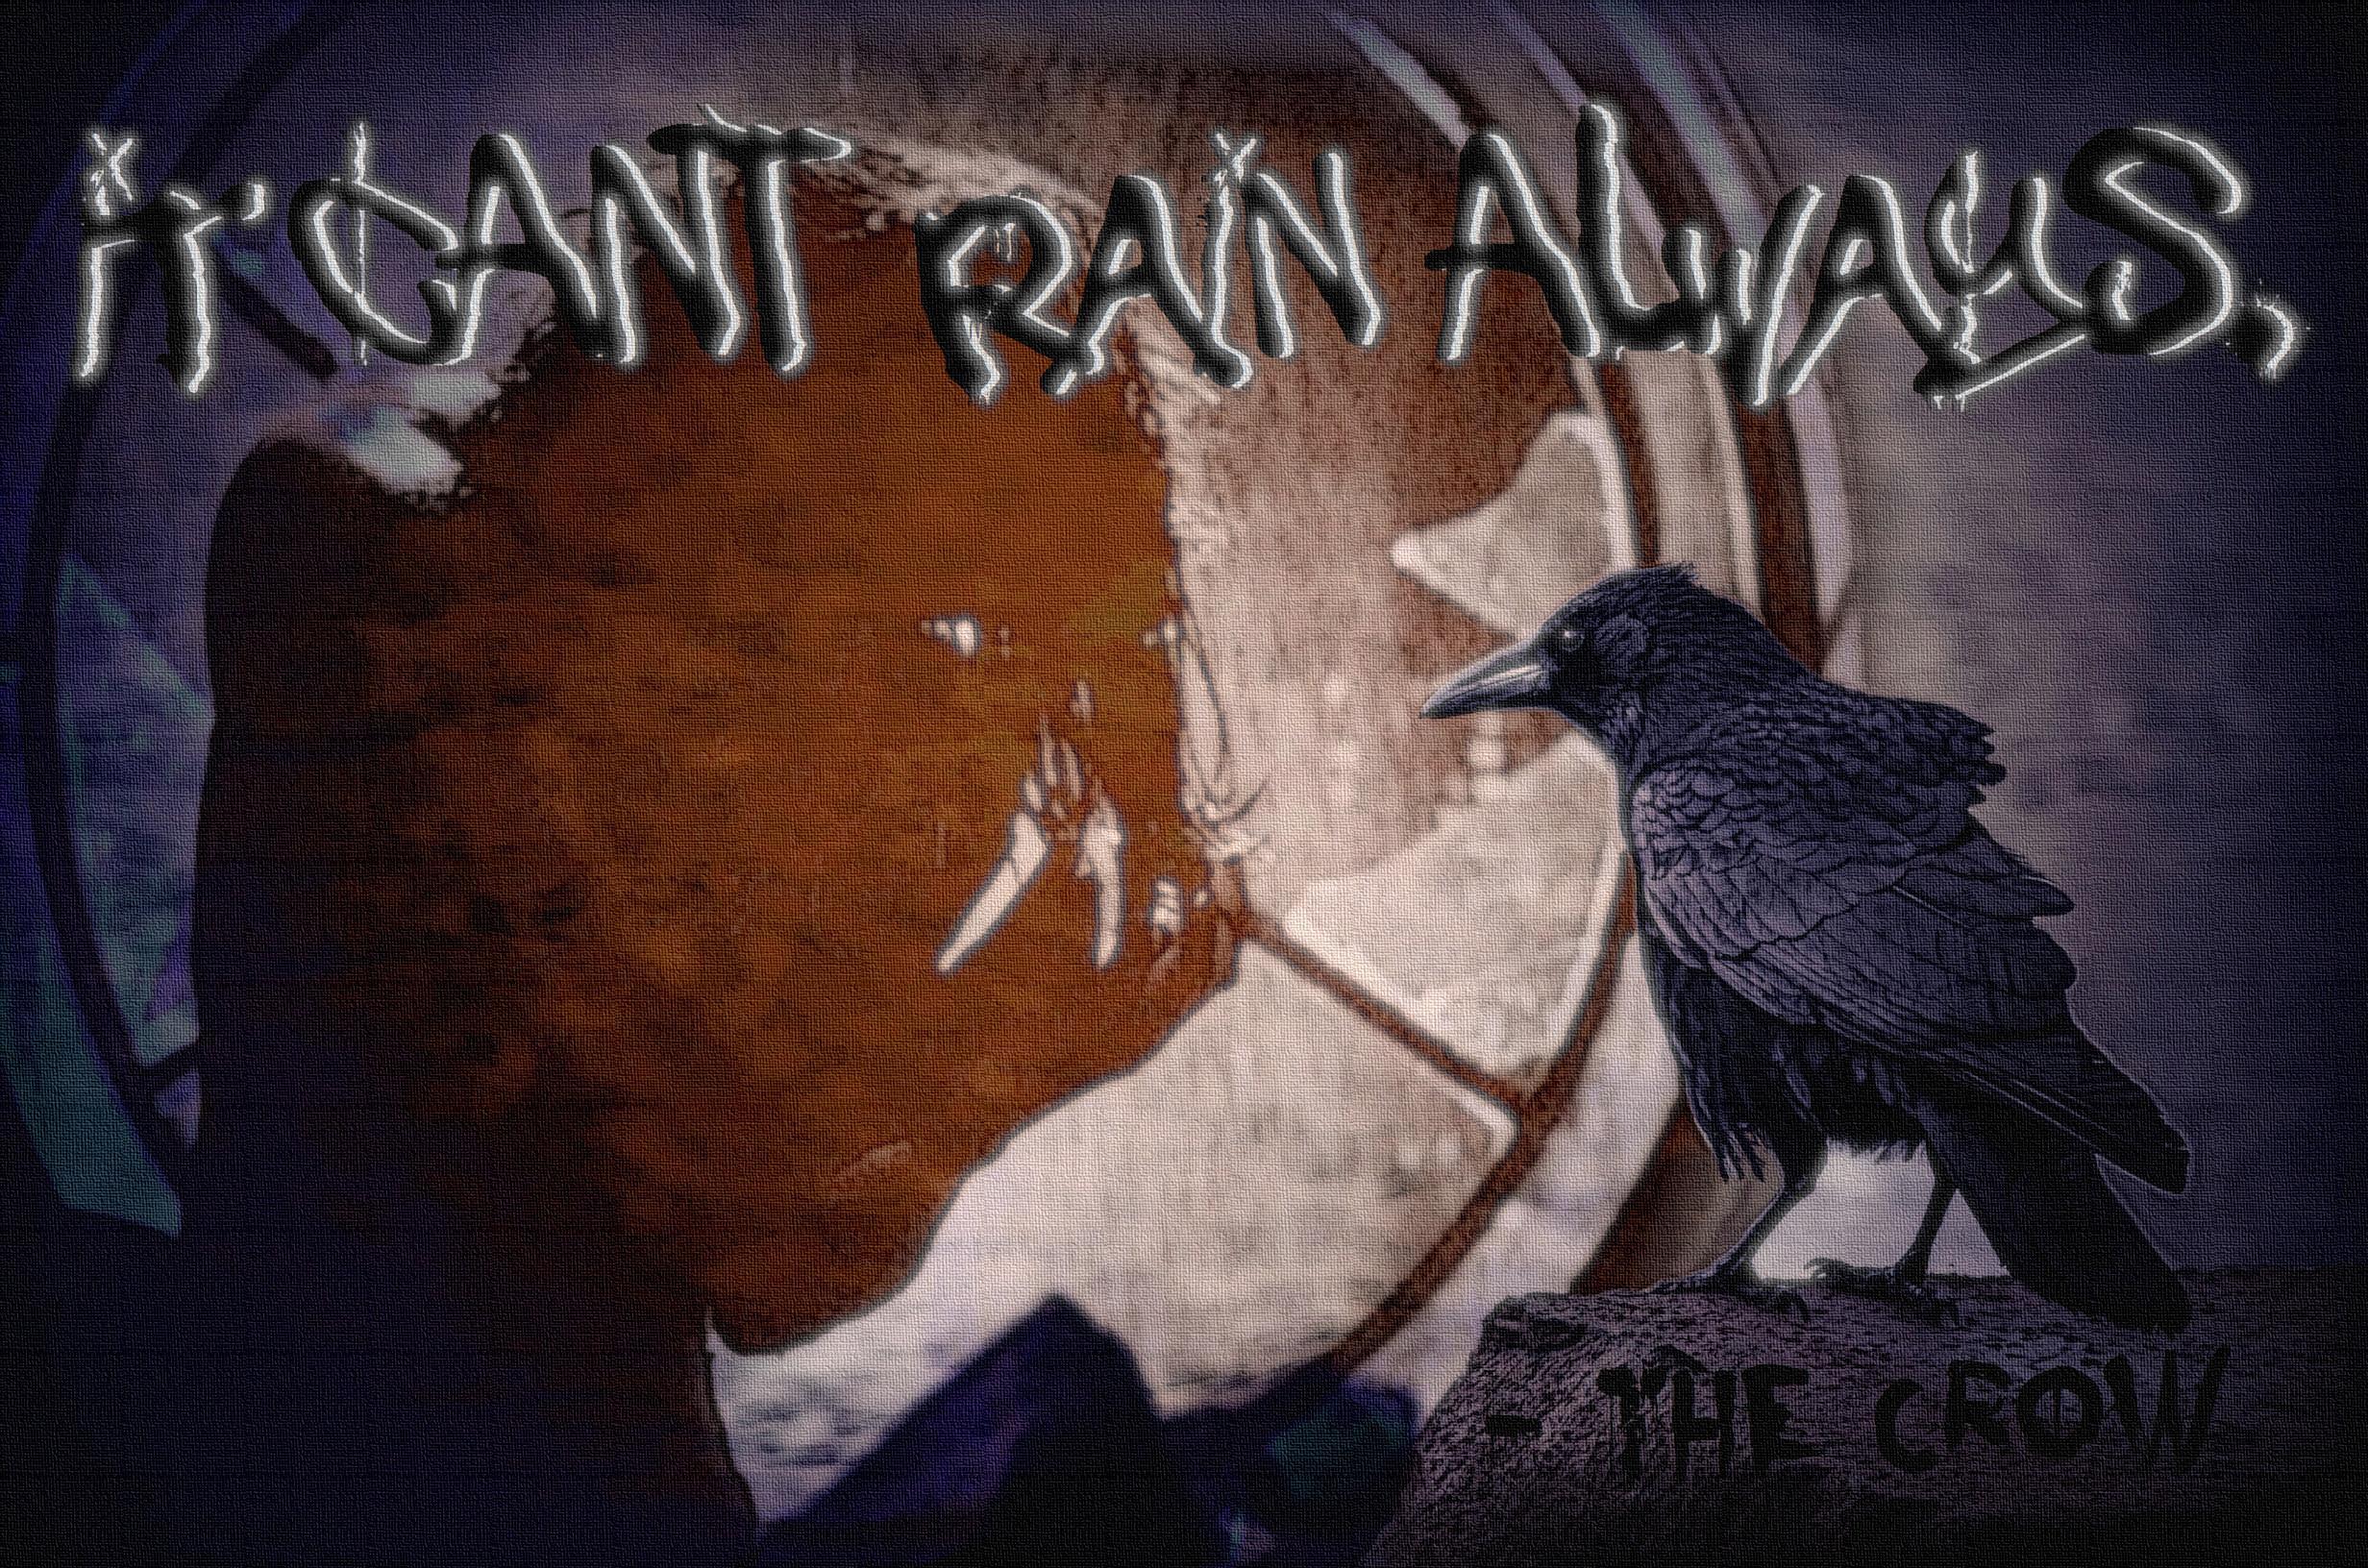 """It can't rain always"" – The Crow [2464×1632] [OC]"